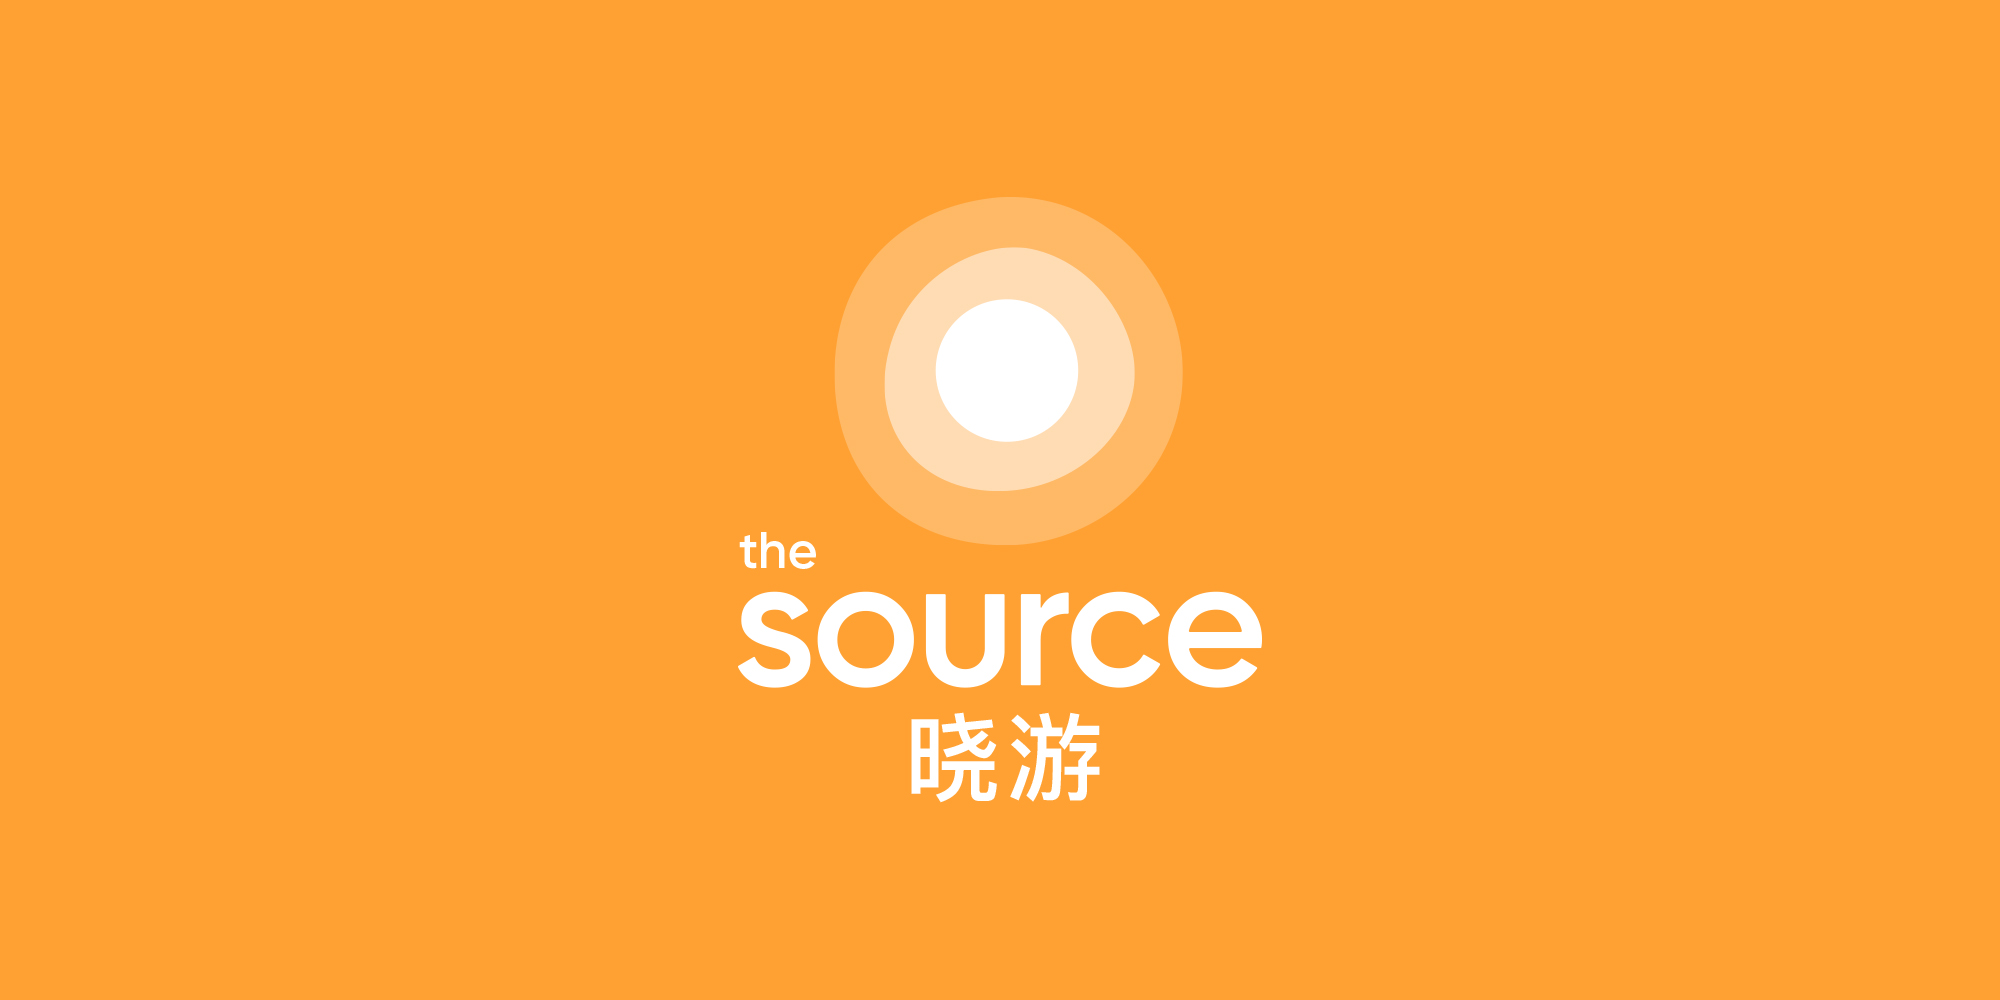 Source_OrangeTop.jpg